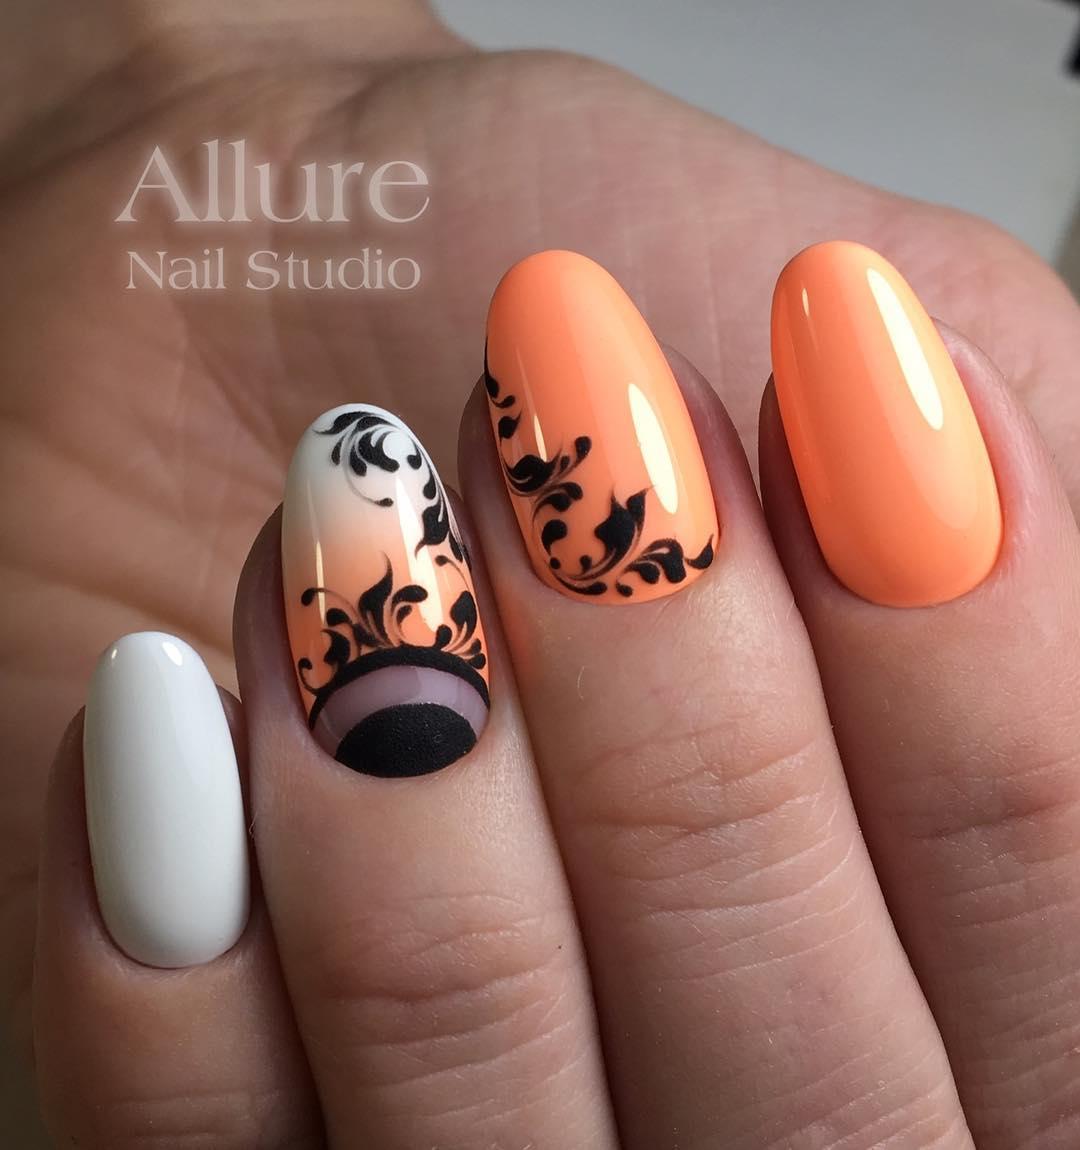 allure_nail_studio-3.jpg